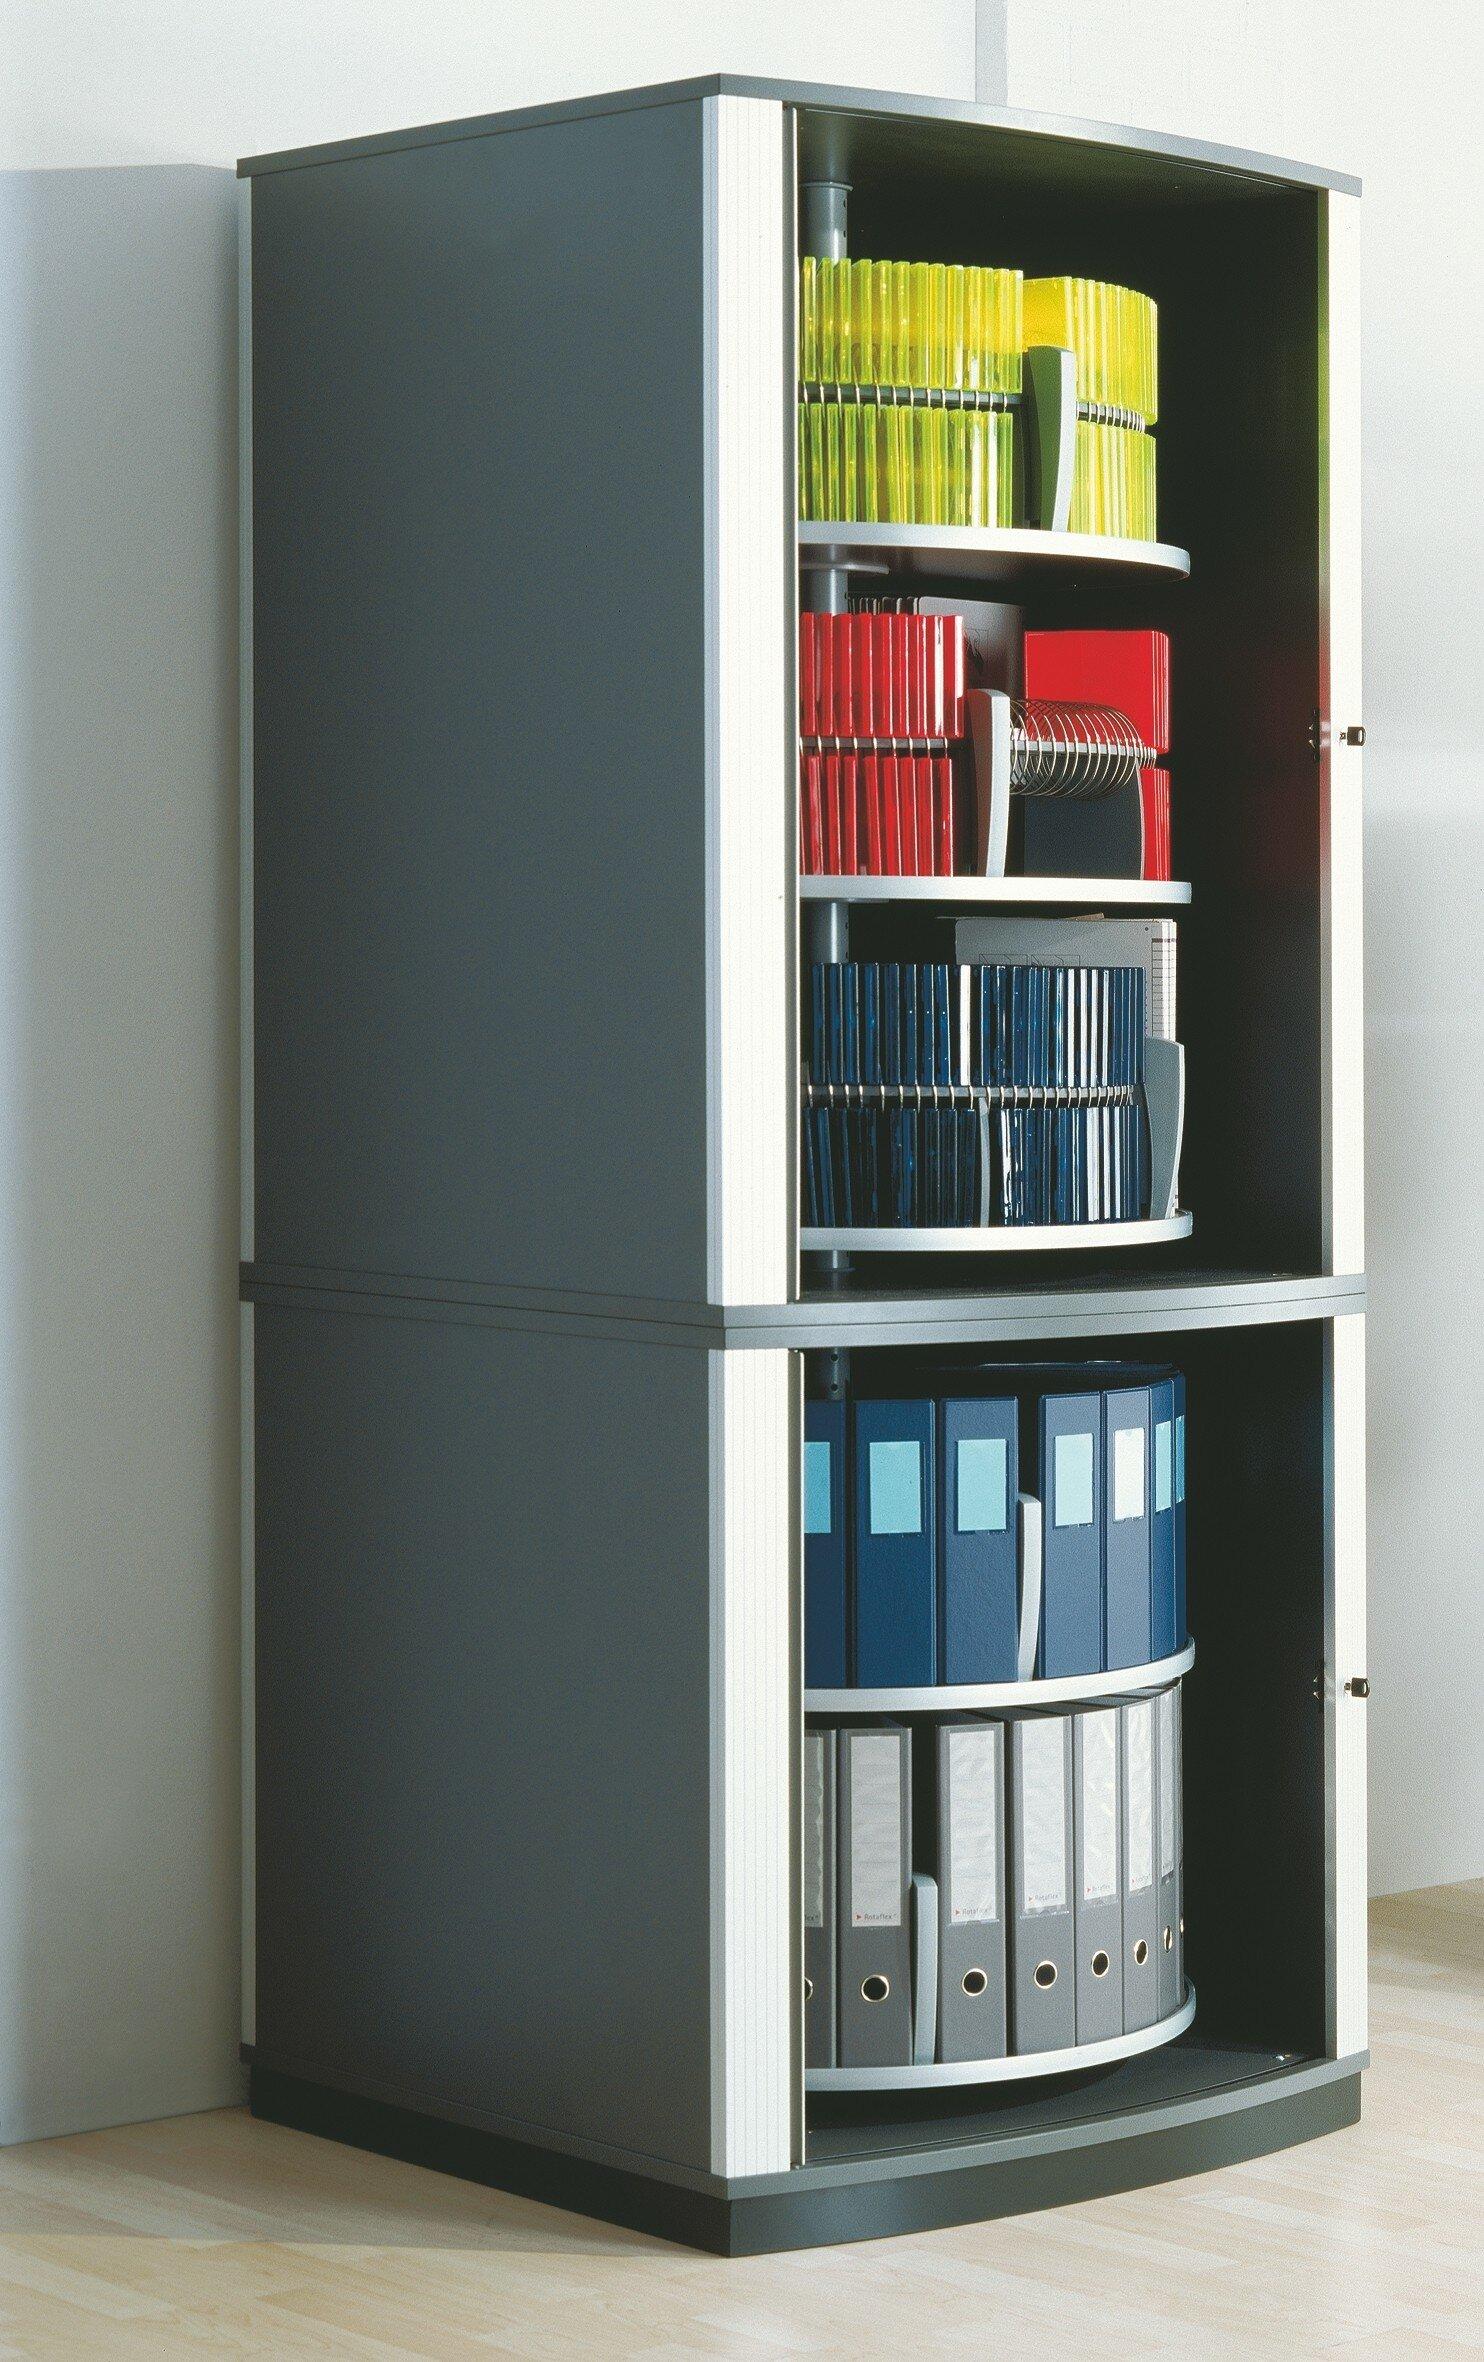 Moll 85 H X 36 W X 36 D Lockfile Binder And File Carousel Cabinet 5 Shelves Shelving Unit Wayfair